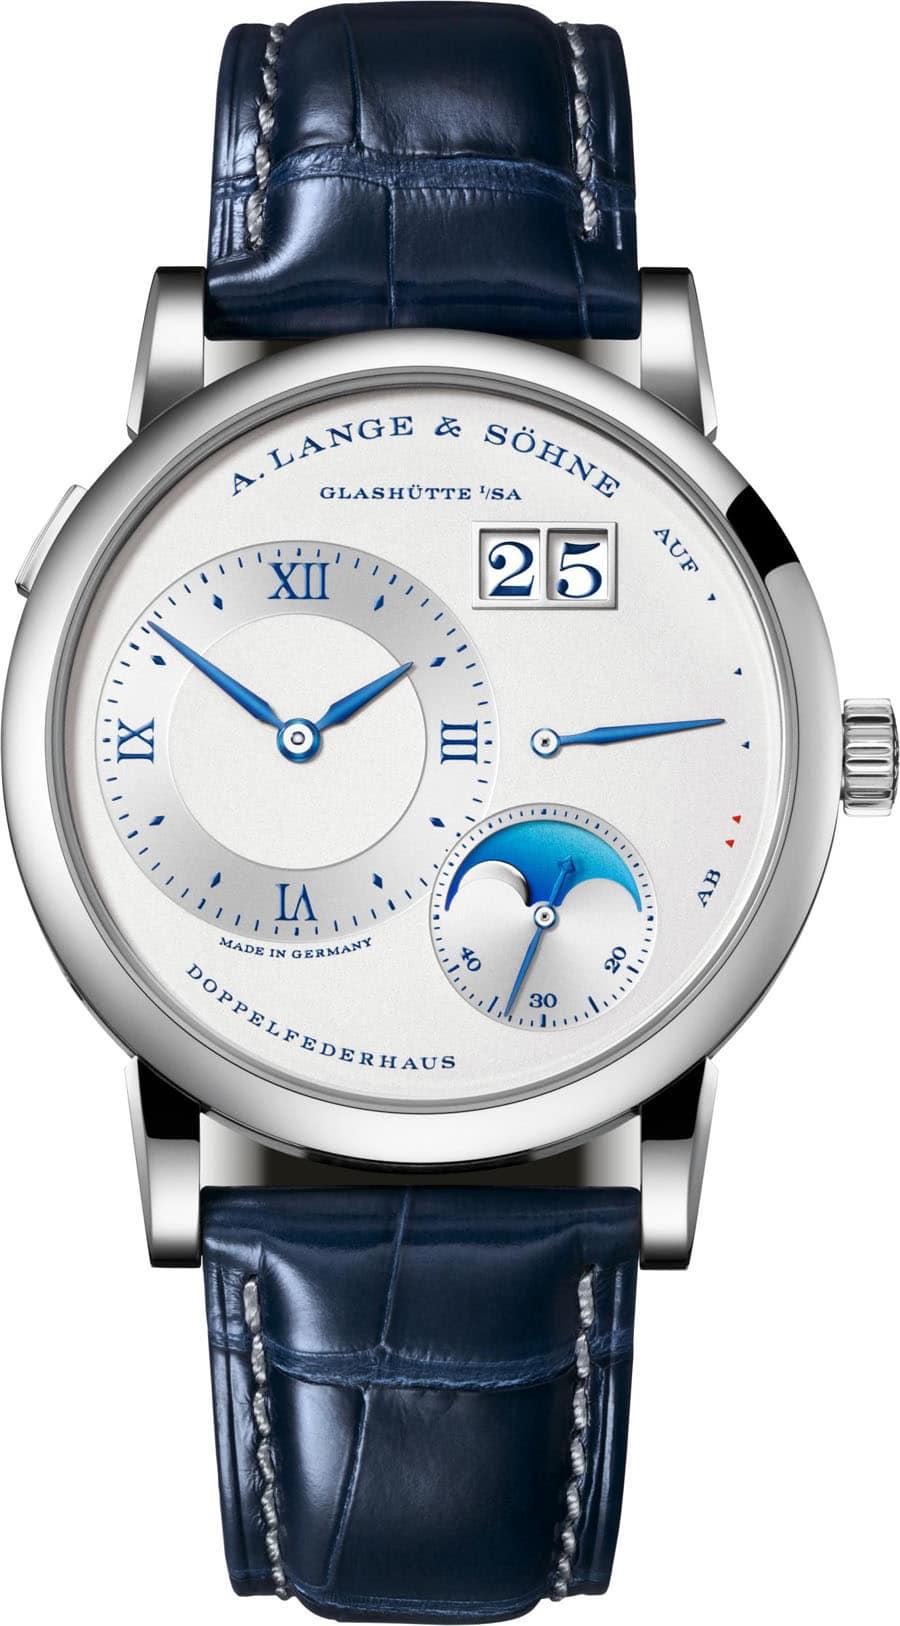 "A. Lange & Söhne: Lange 1 Mondphase  ""25th Anniversary"""